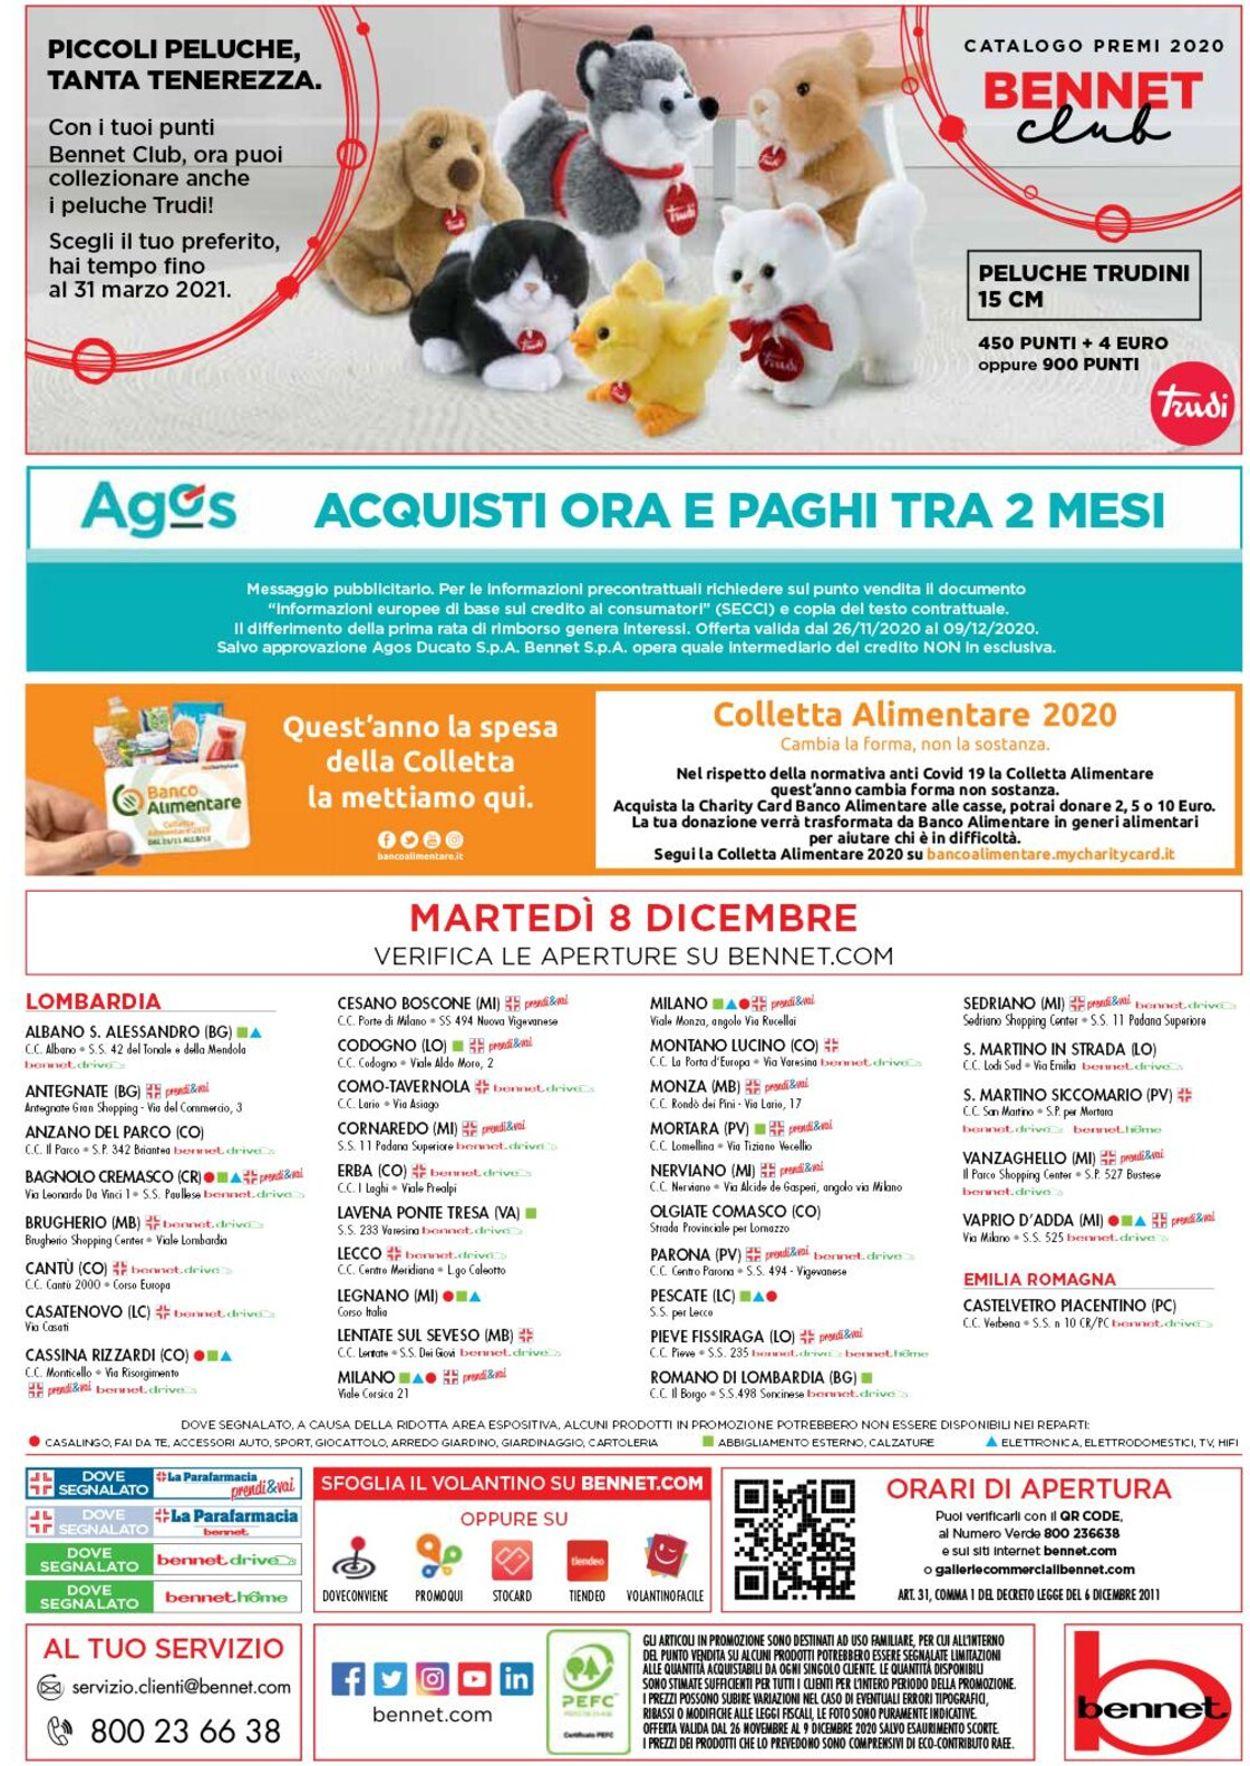 Volantino bennet - Black Friday 2020 - Offerte 26/11-09/12/2020 (Pagina 32)